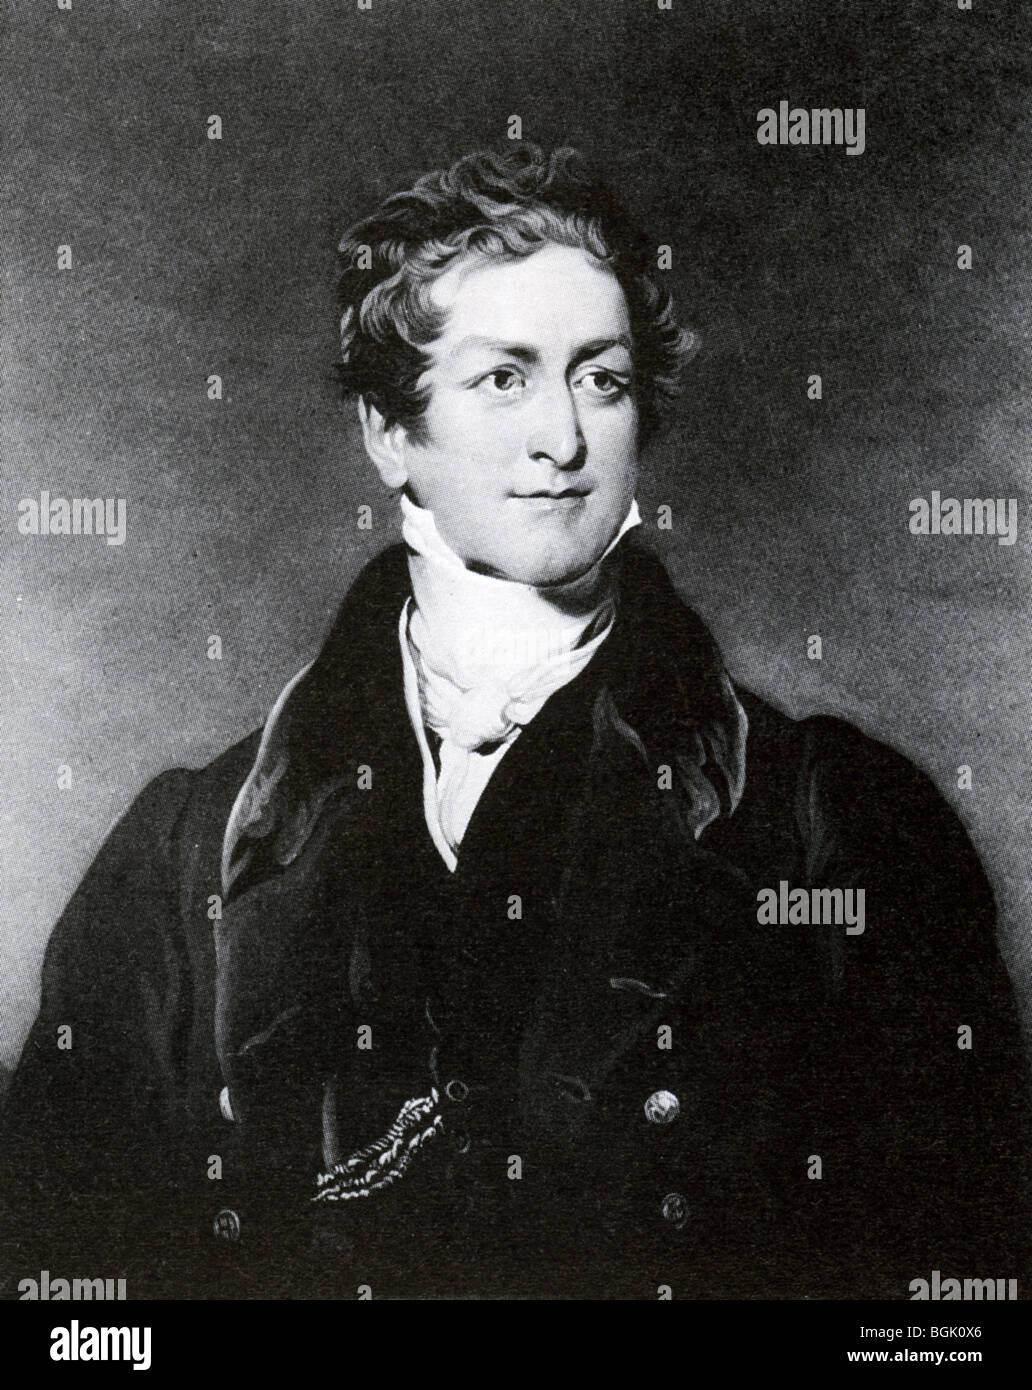 SIR ROBERT PEEL - English statesman and Prime Minister (1788-1850) engaving after painting by Sir Thomas Lawrence - Stock Image